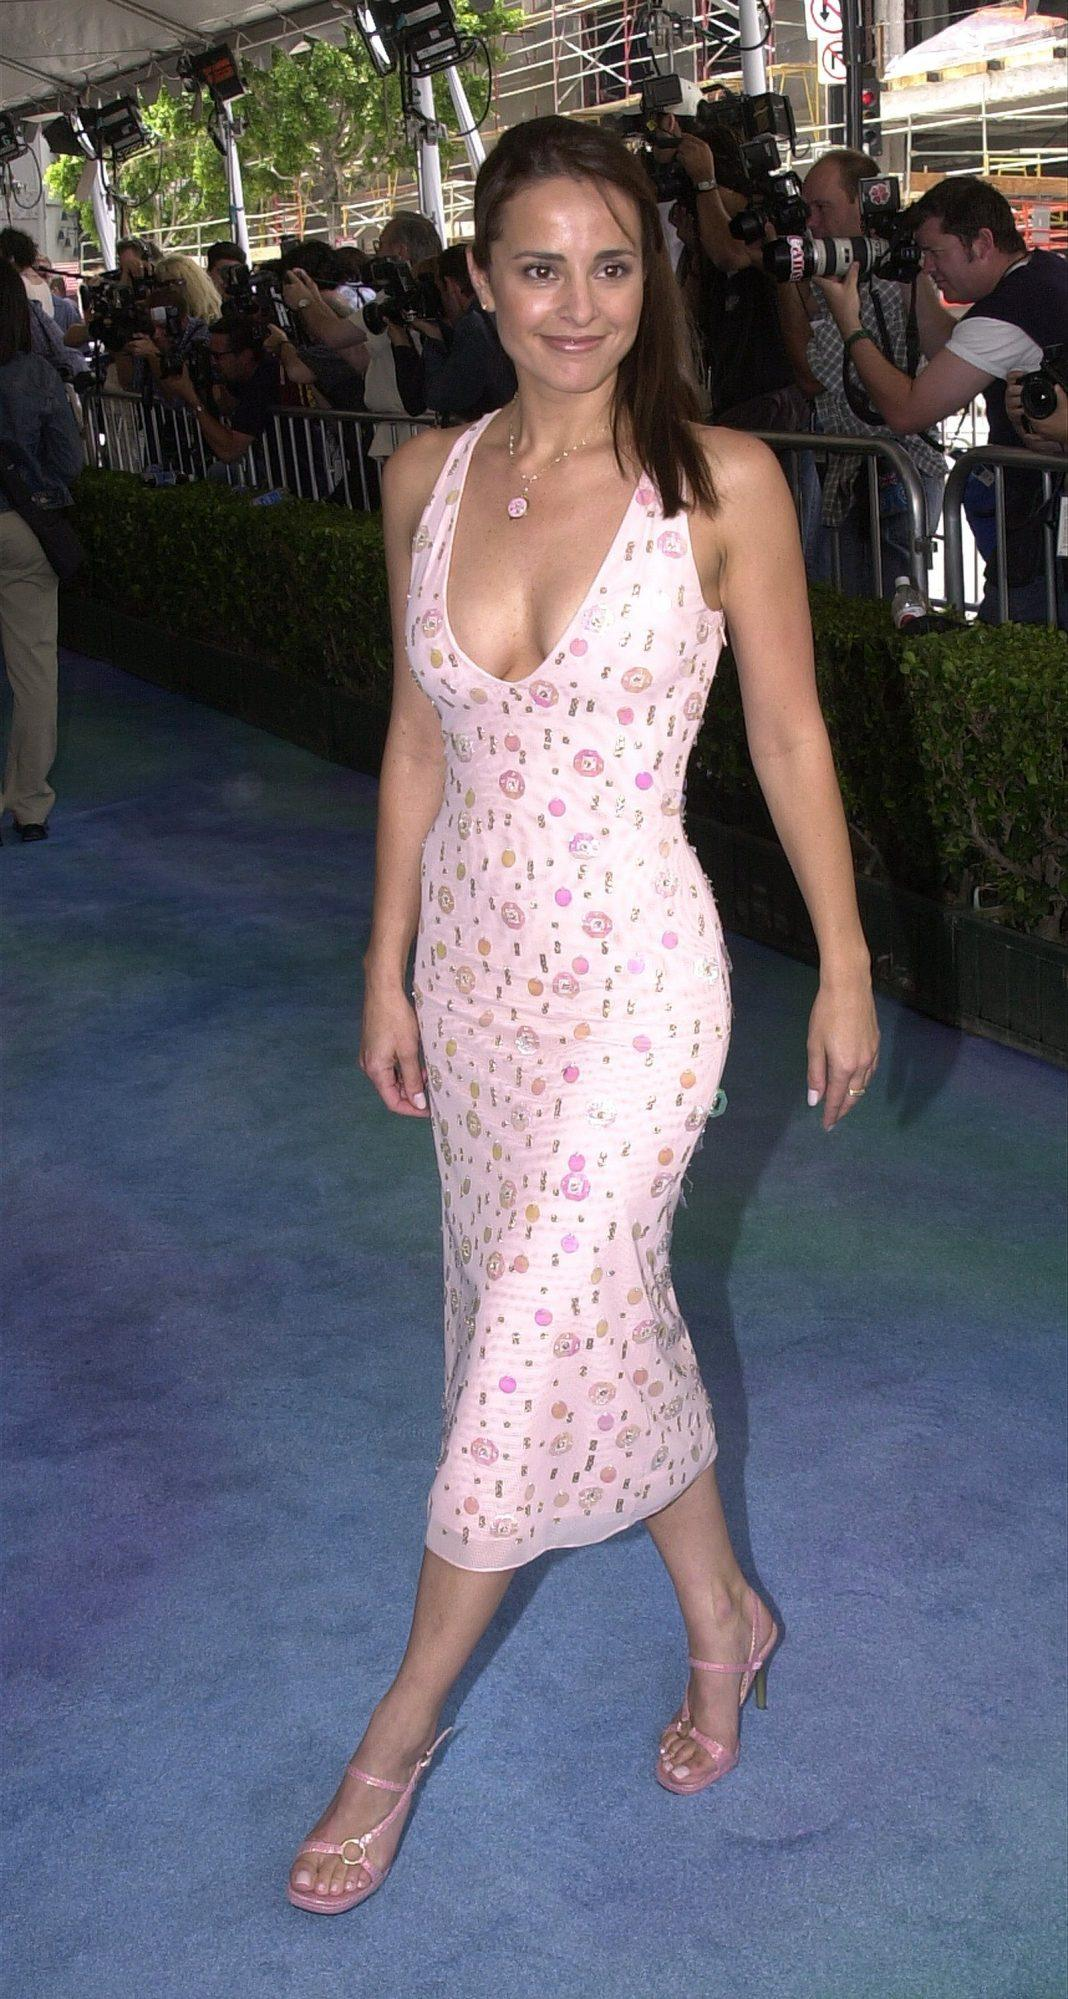 Jacqueline Obradors hot side boobs pics